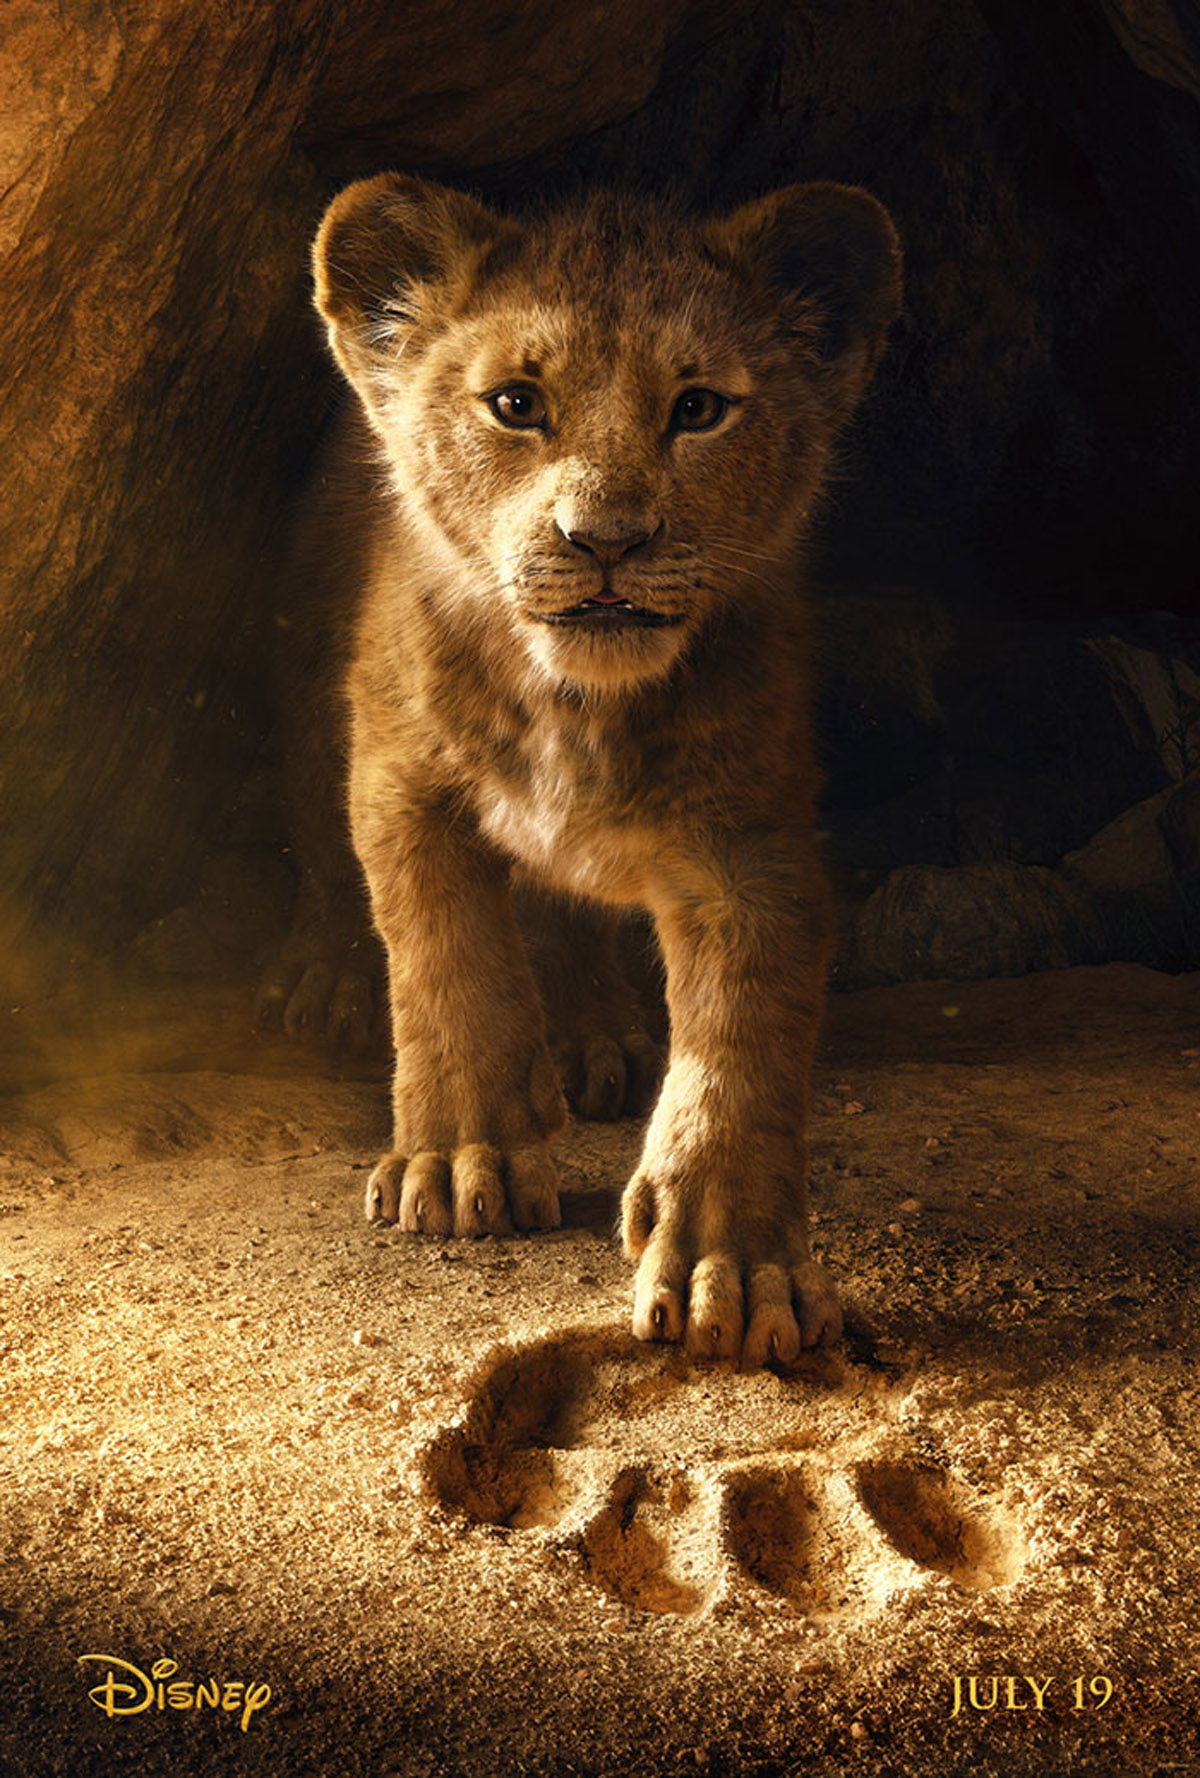 Simba in Lion King poster (via boredpanda.com)